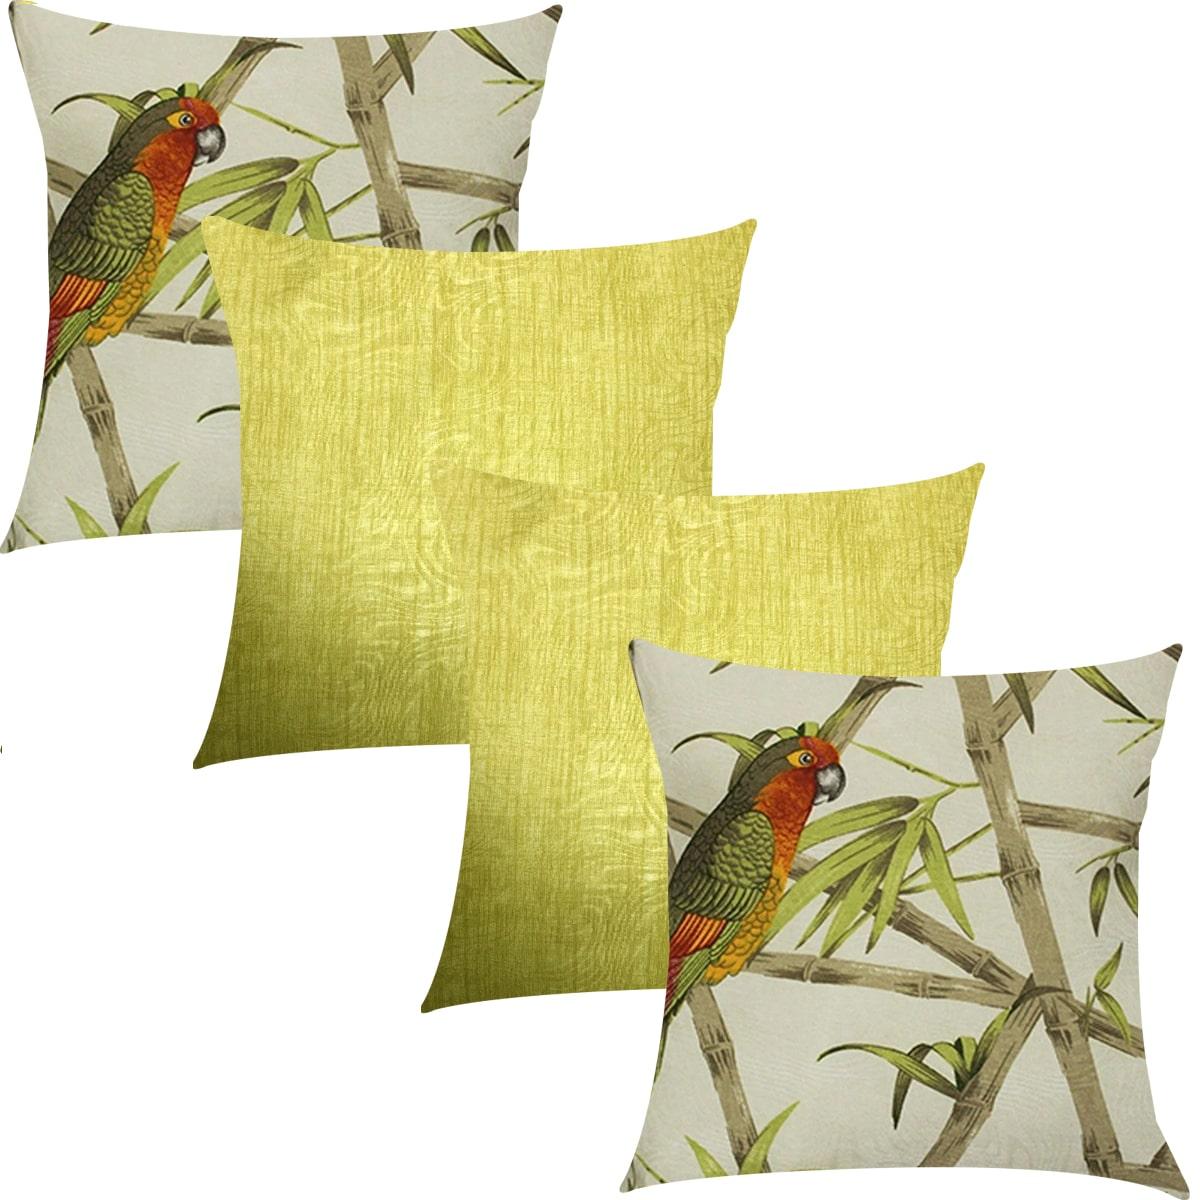 Kit 4 Capas de Almofadas Composê Pássaros e Amarelo Liso 45cmx45cm